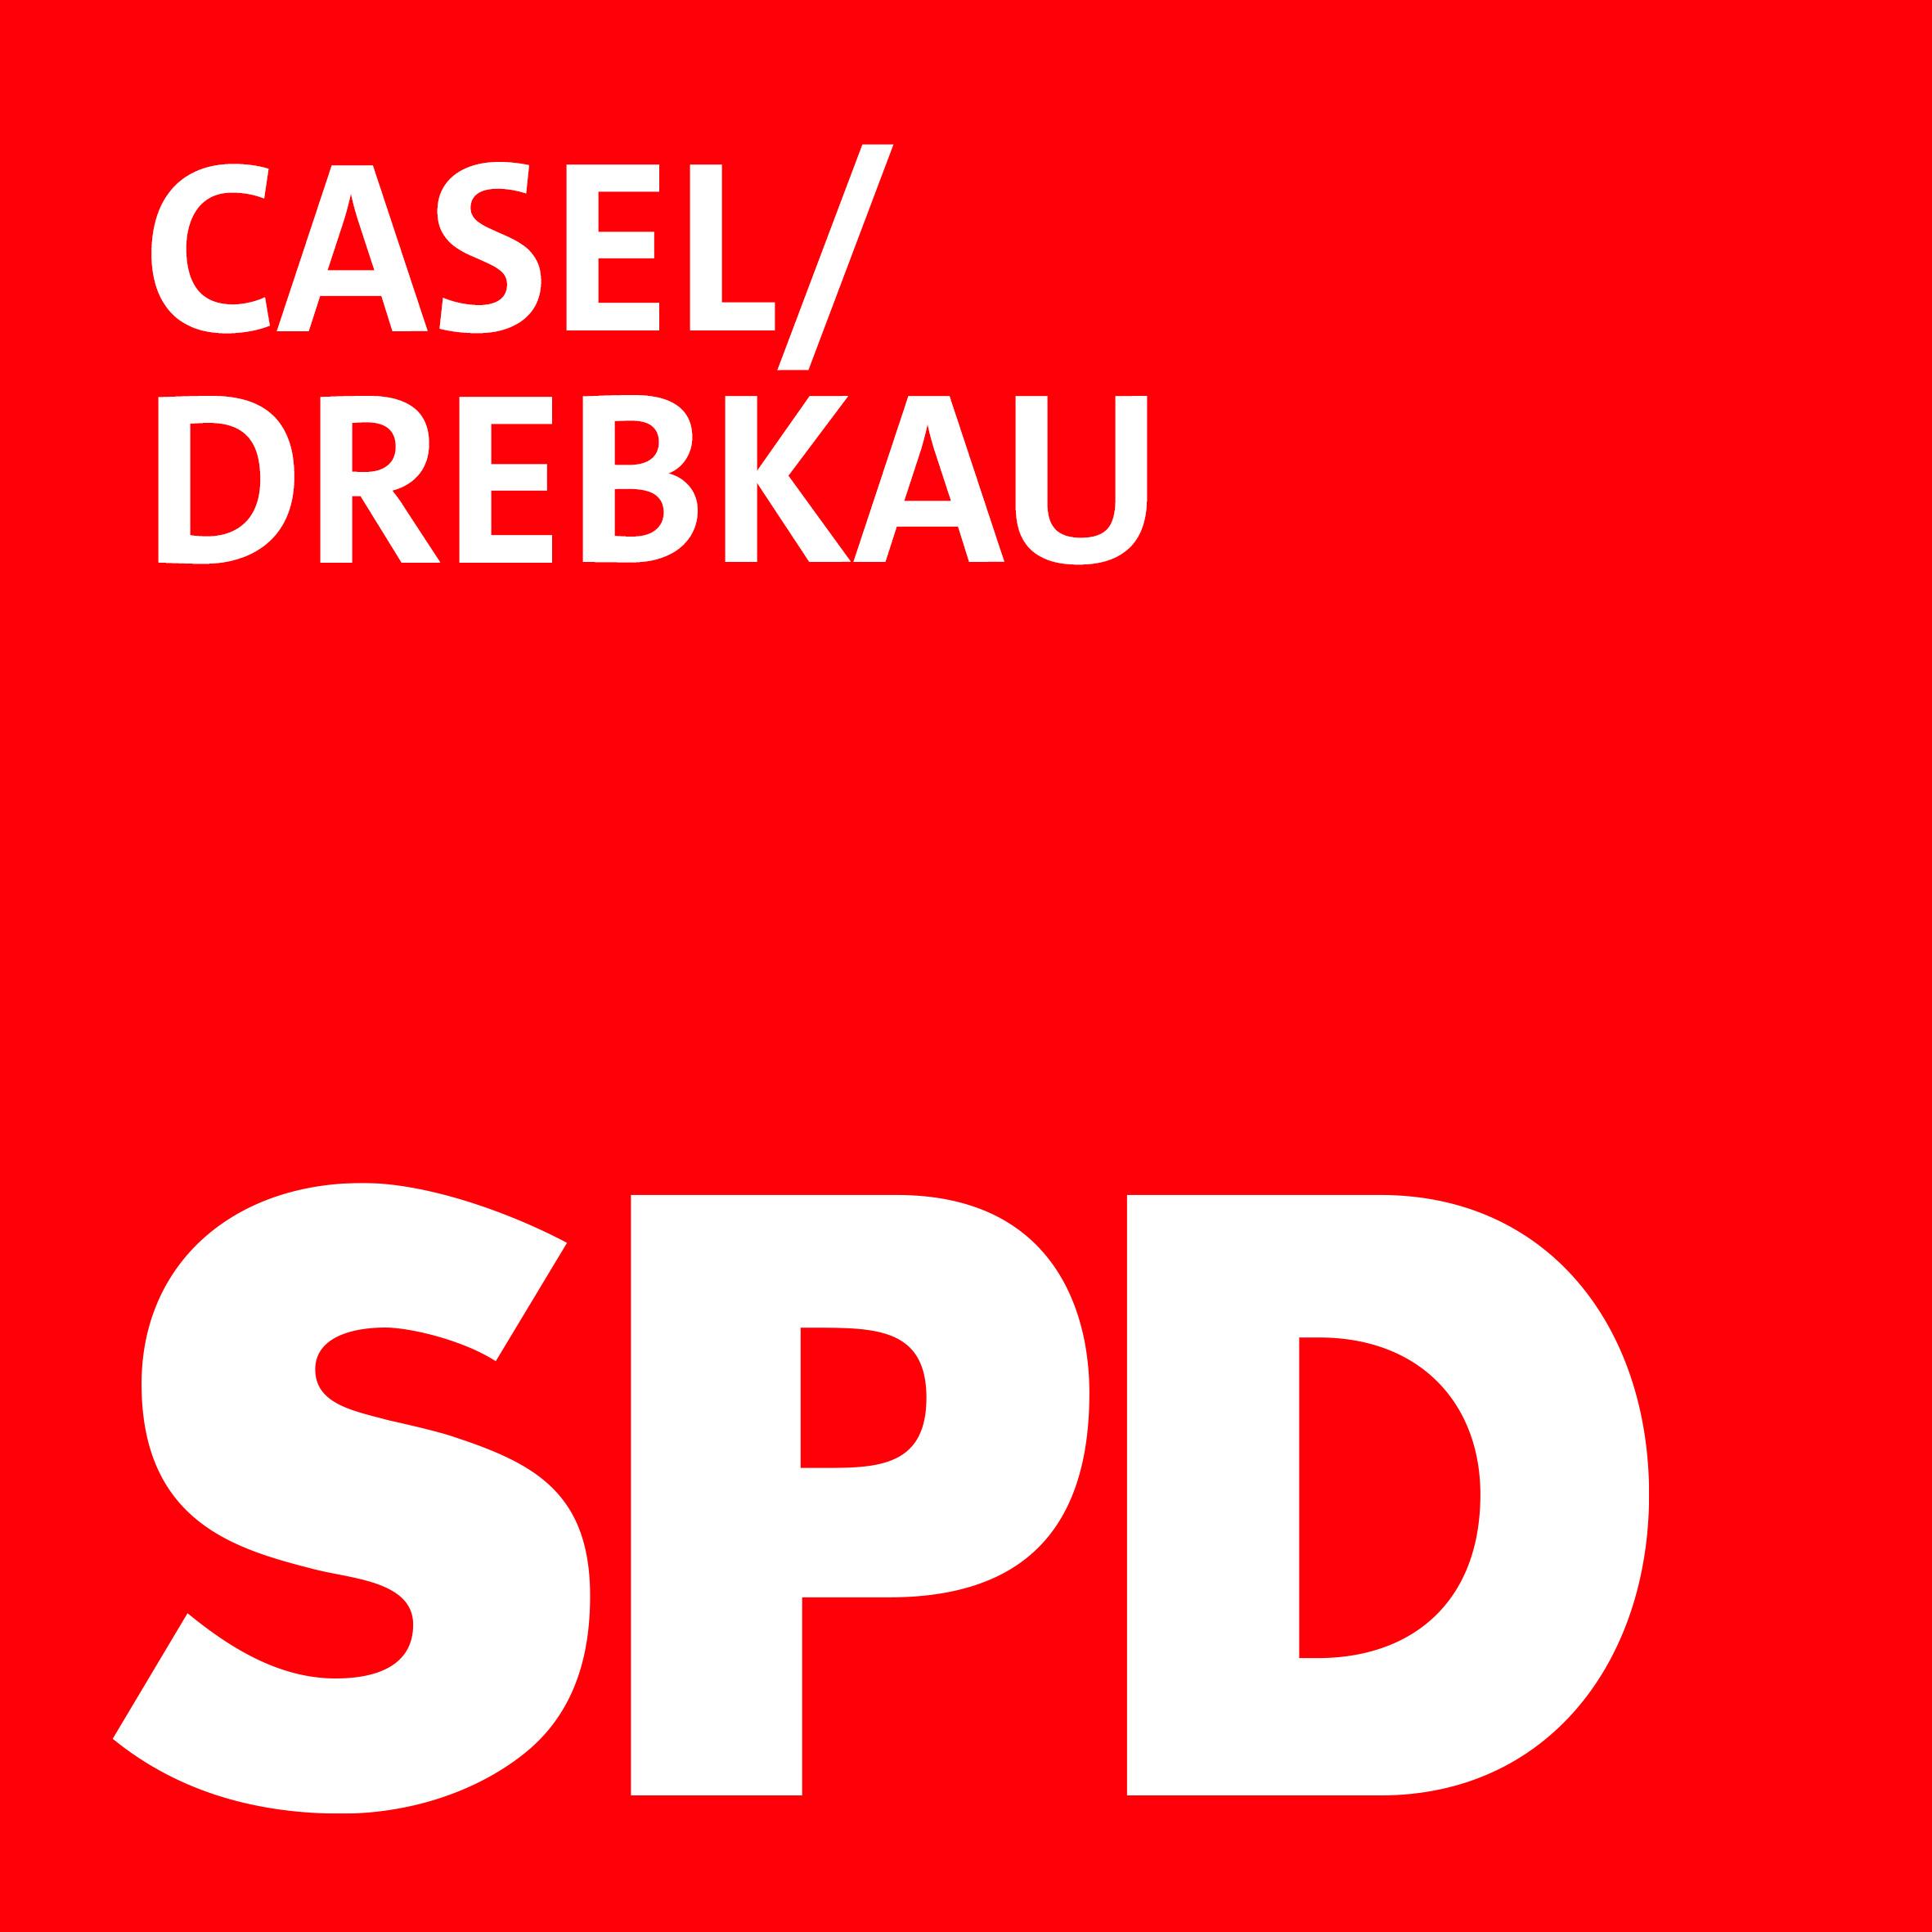 SPD Casel/Drebkau